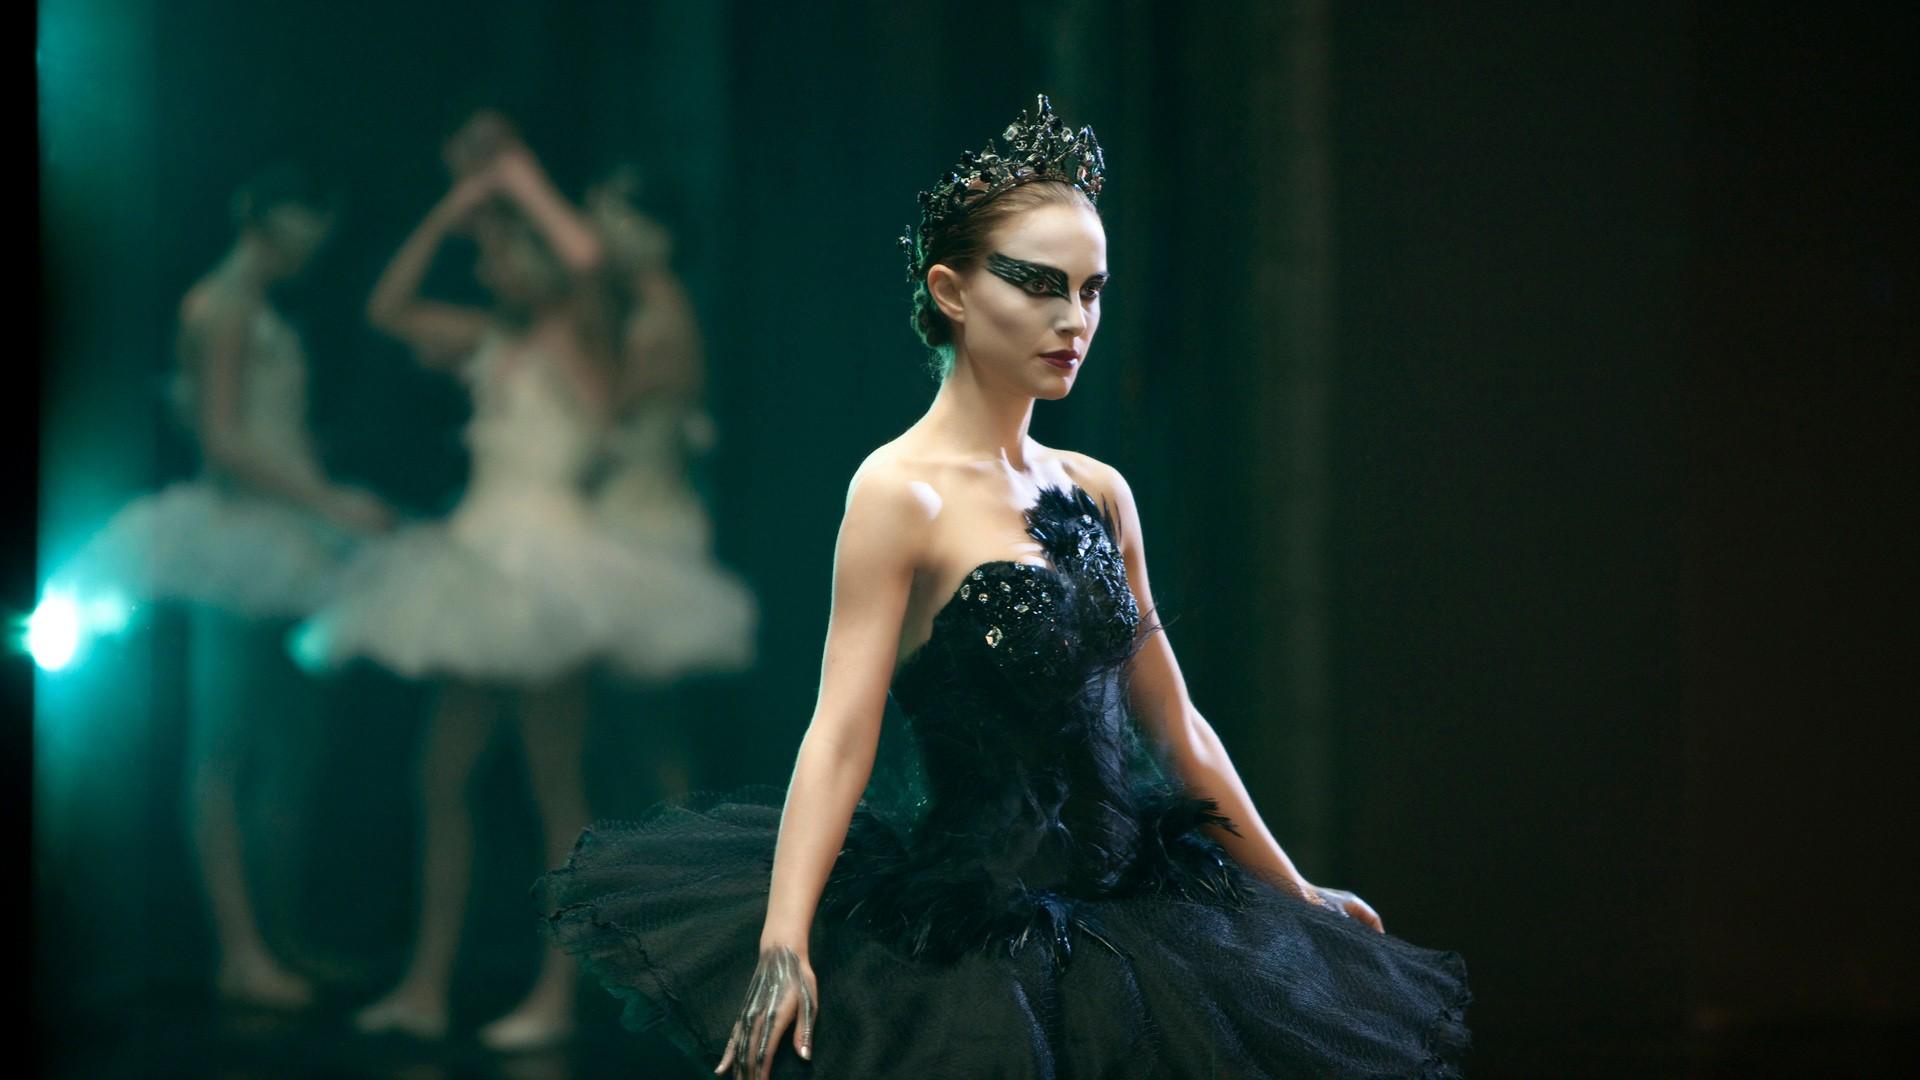 Natalie portman black swan 4